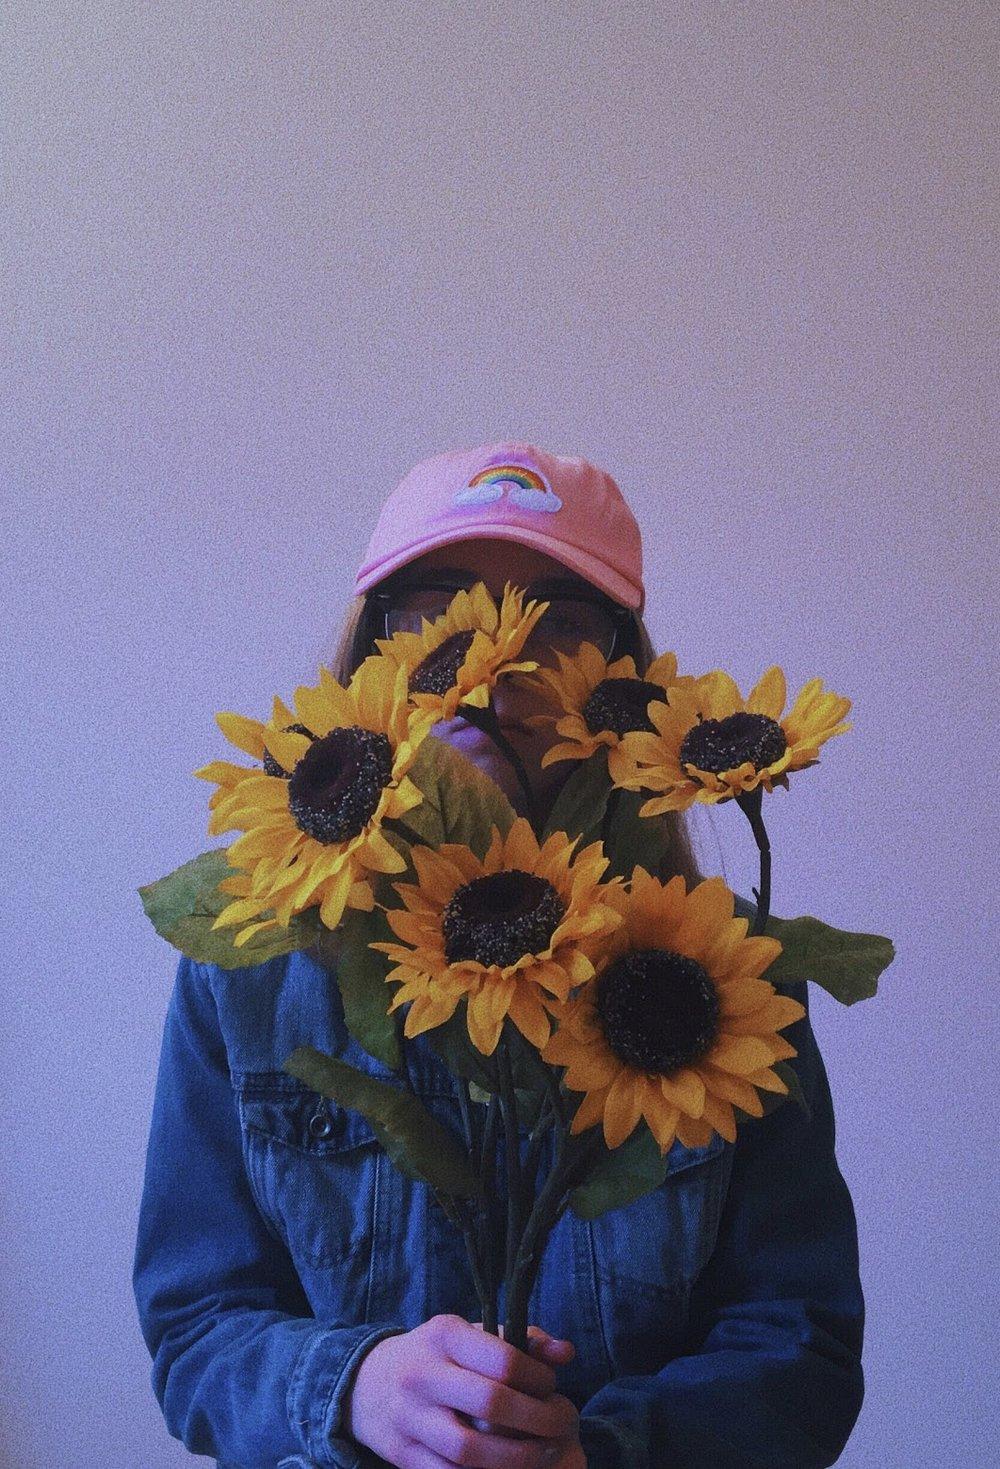 JENNA MRAZ | PHOTOGRAPHER - VISUAL ARTIST